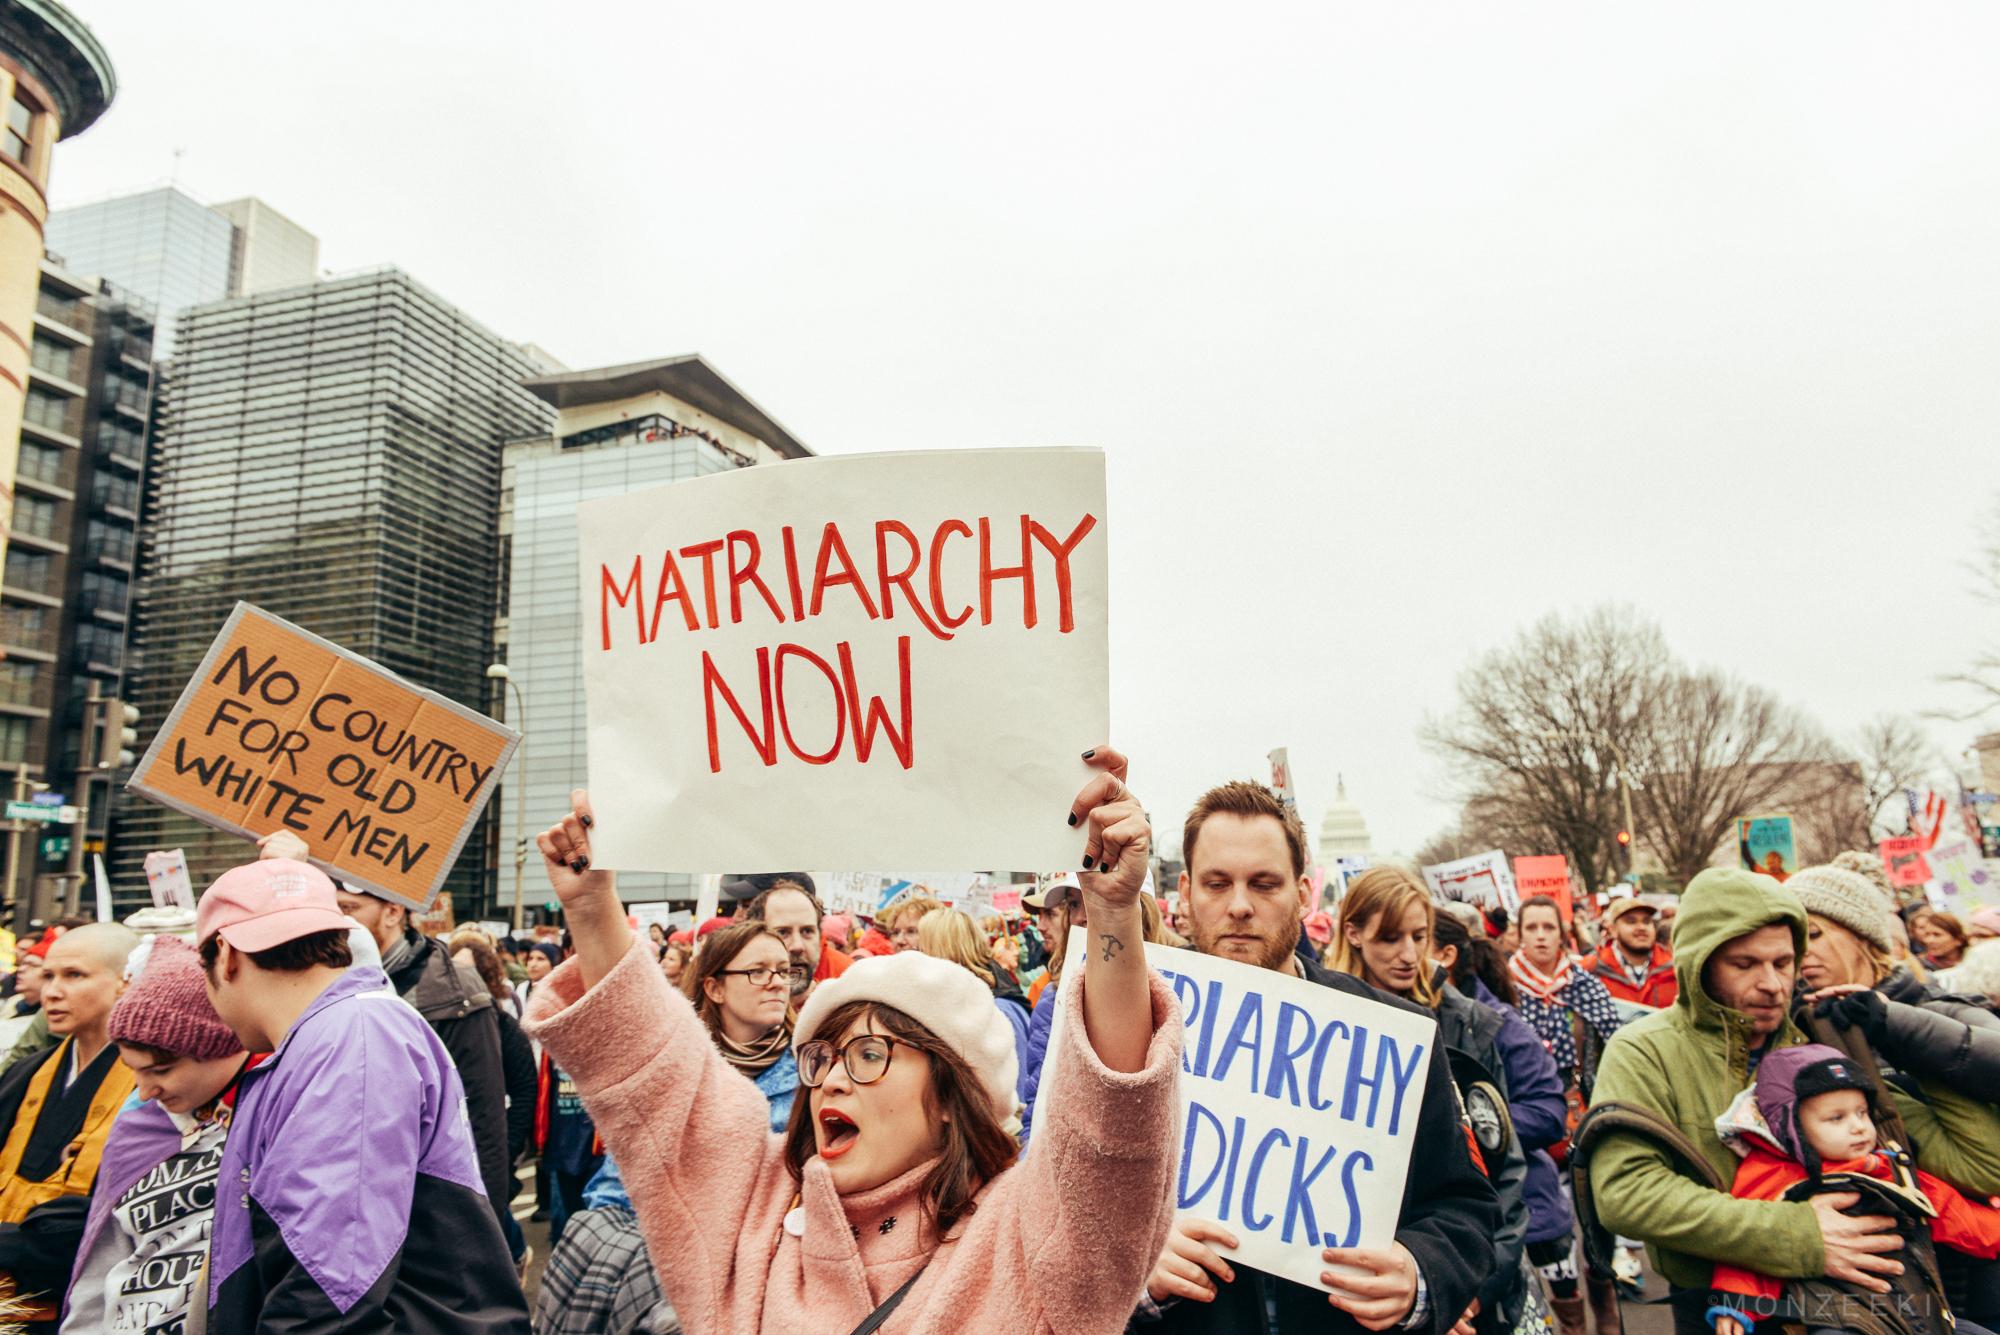 20170121-womens-march-dc-2806.jpg